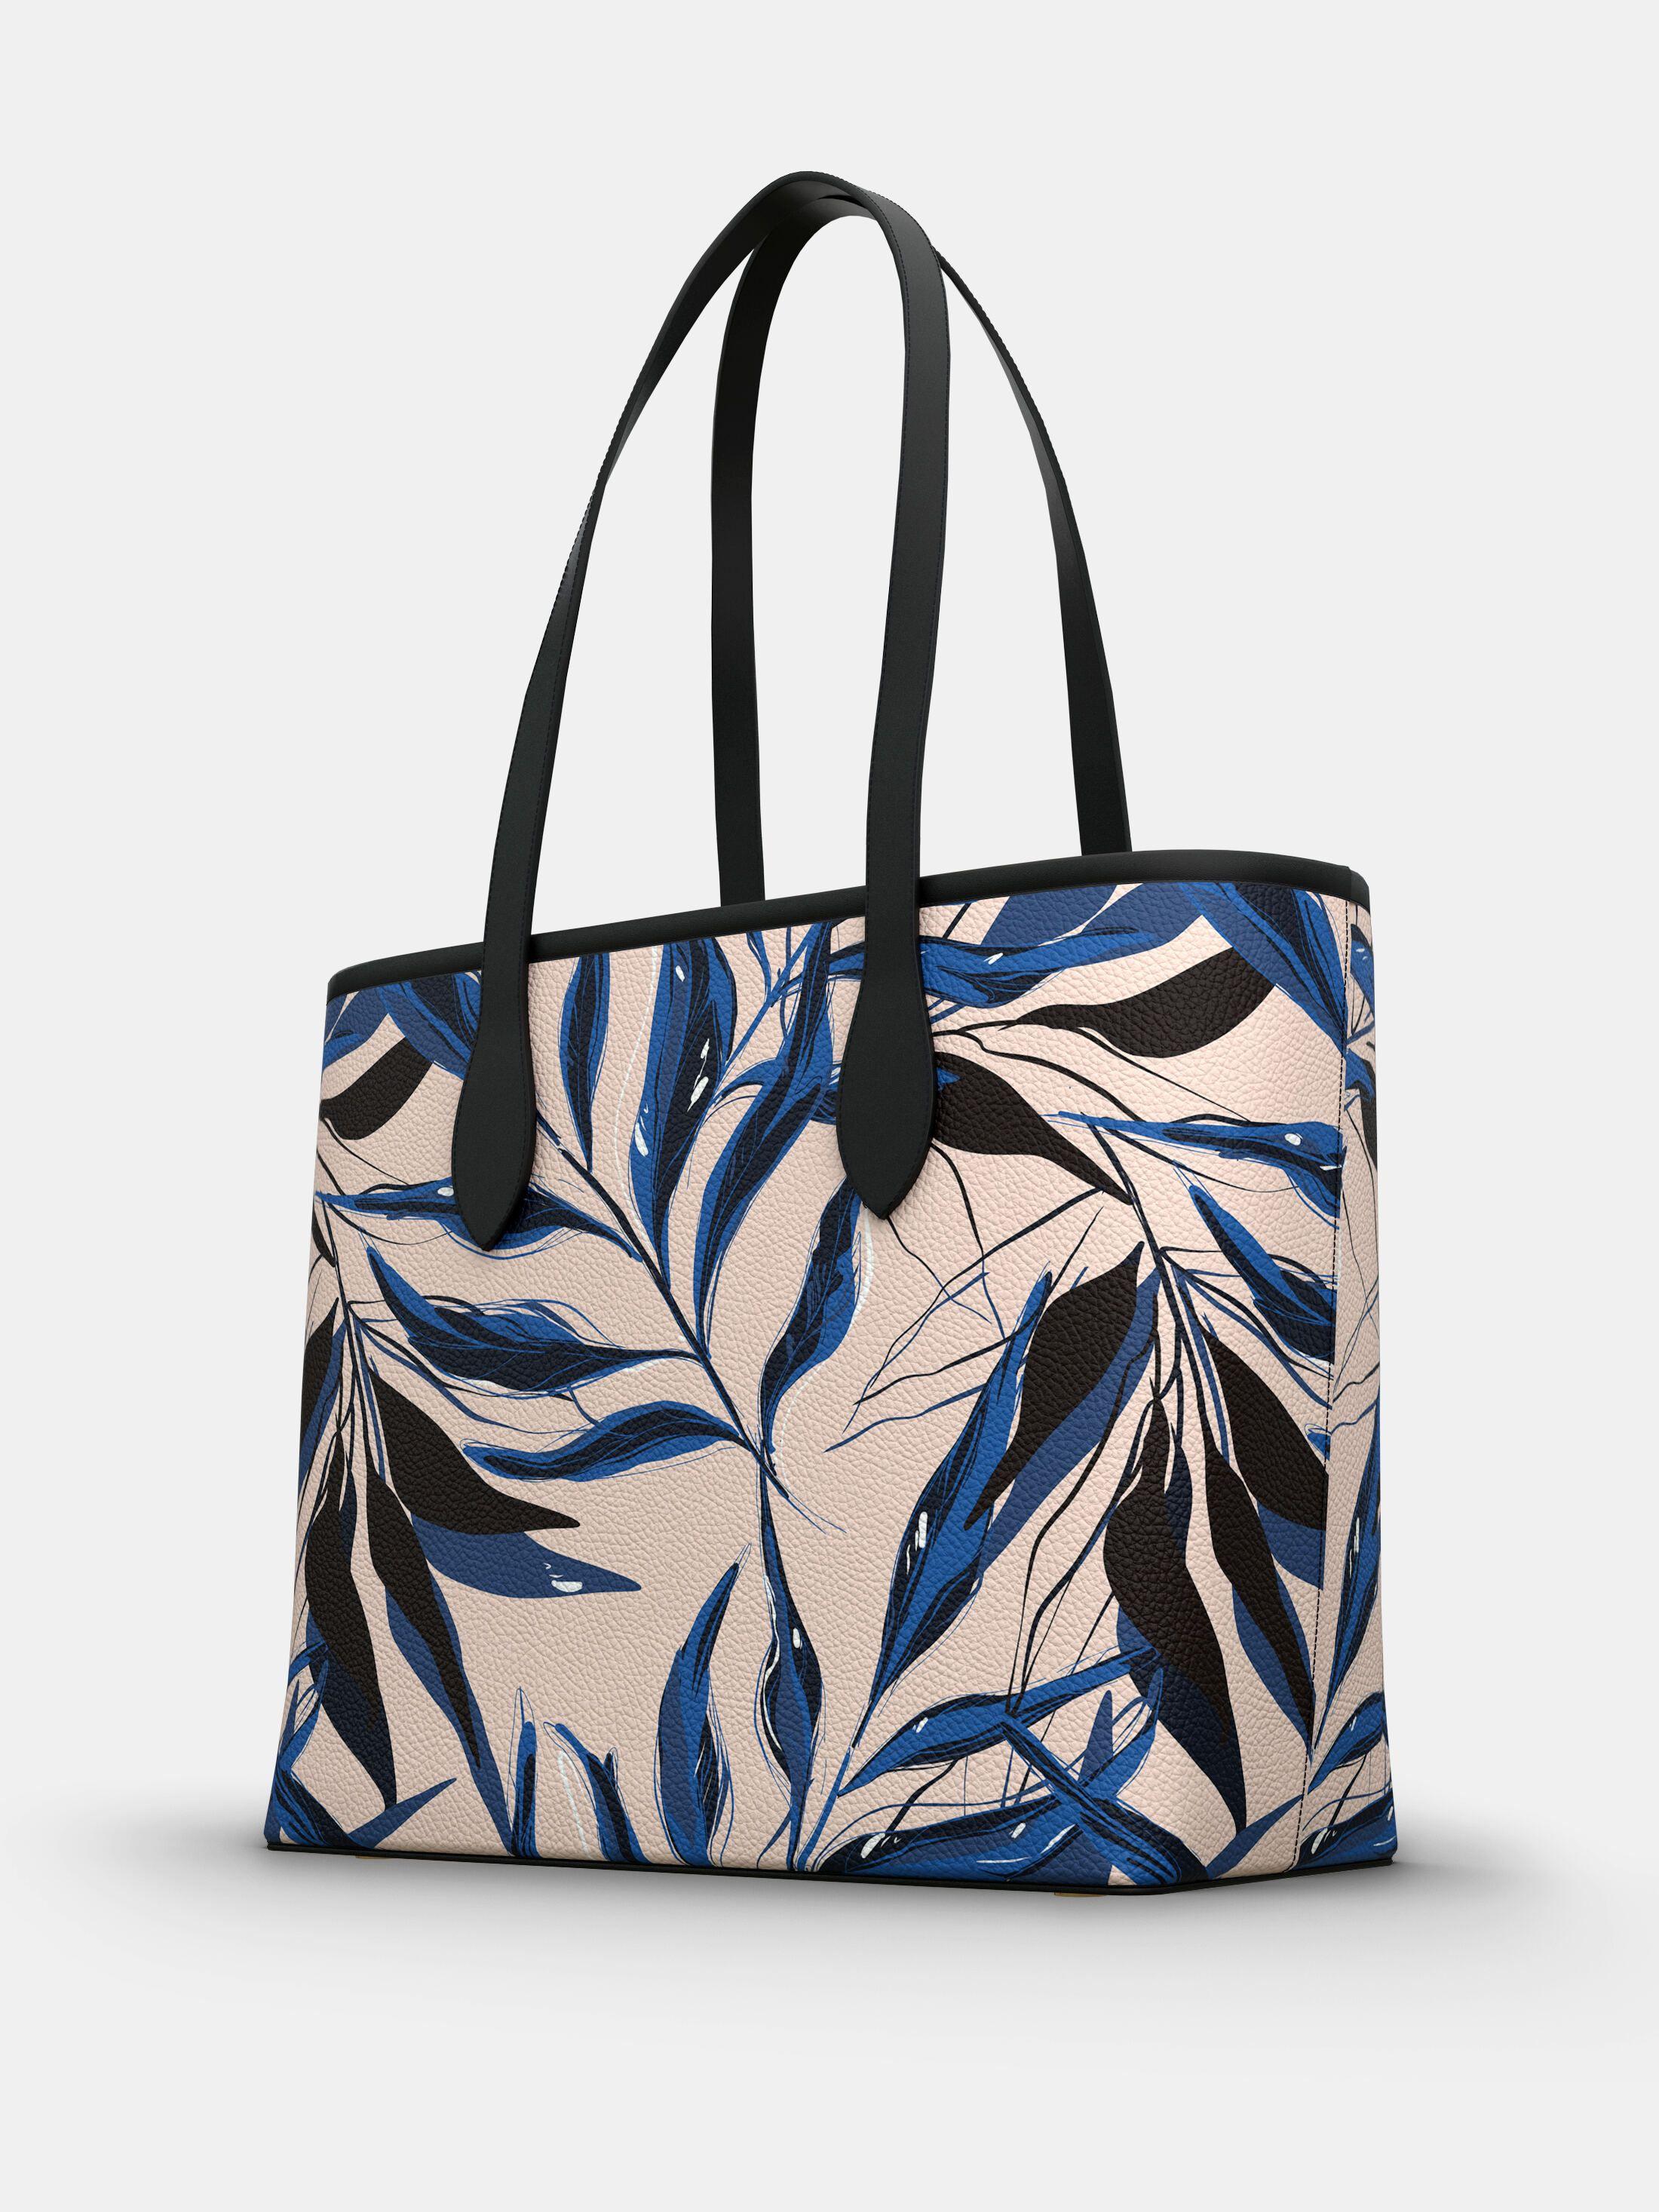 printable City Tote Bag design